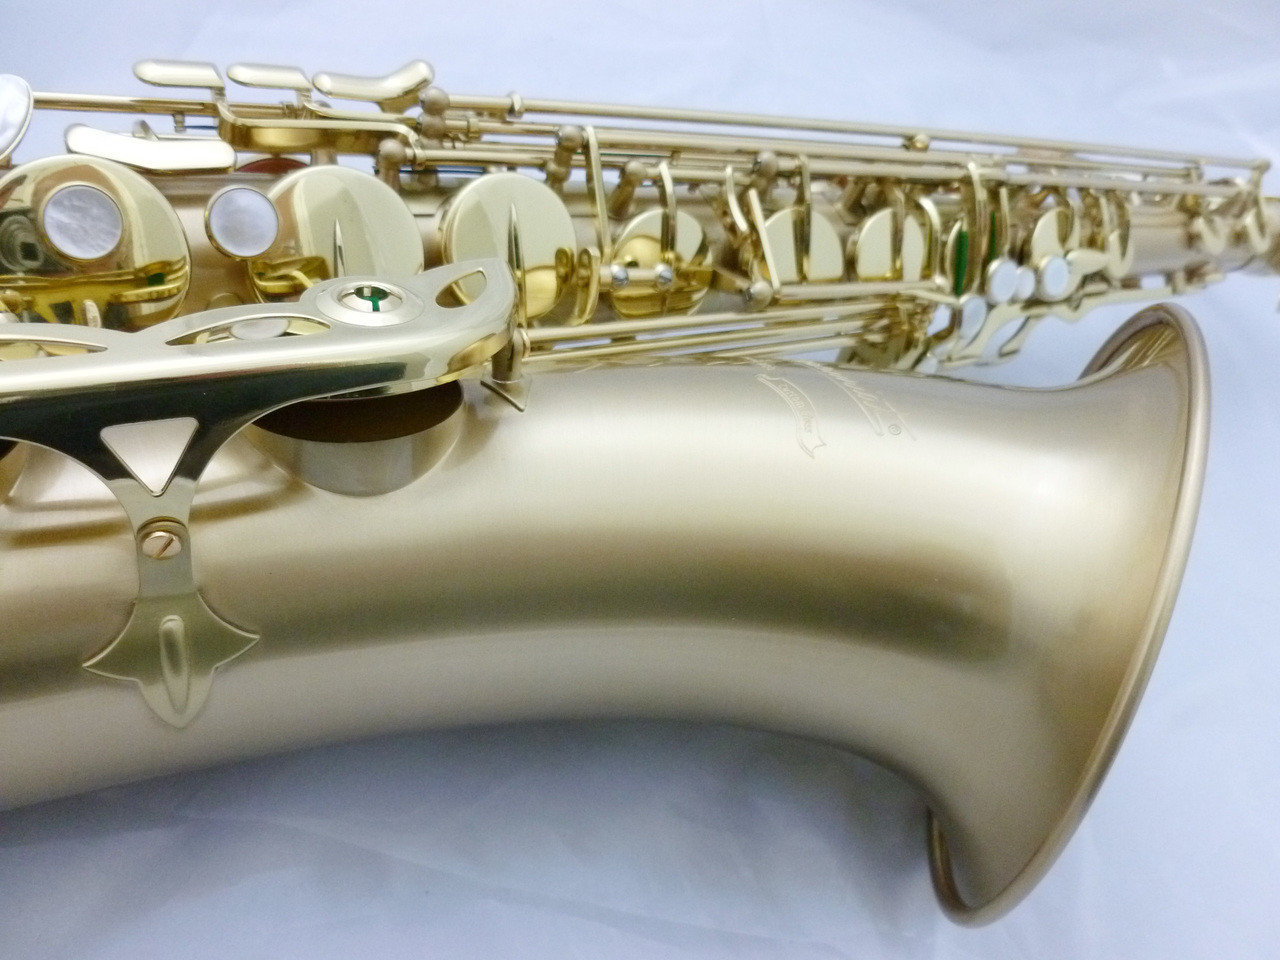 P Mauriat Le Bravo 200 Tenor Saxophone 6